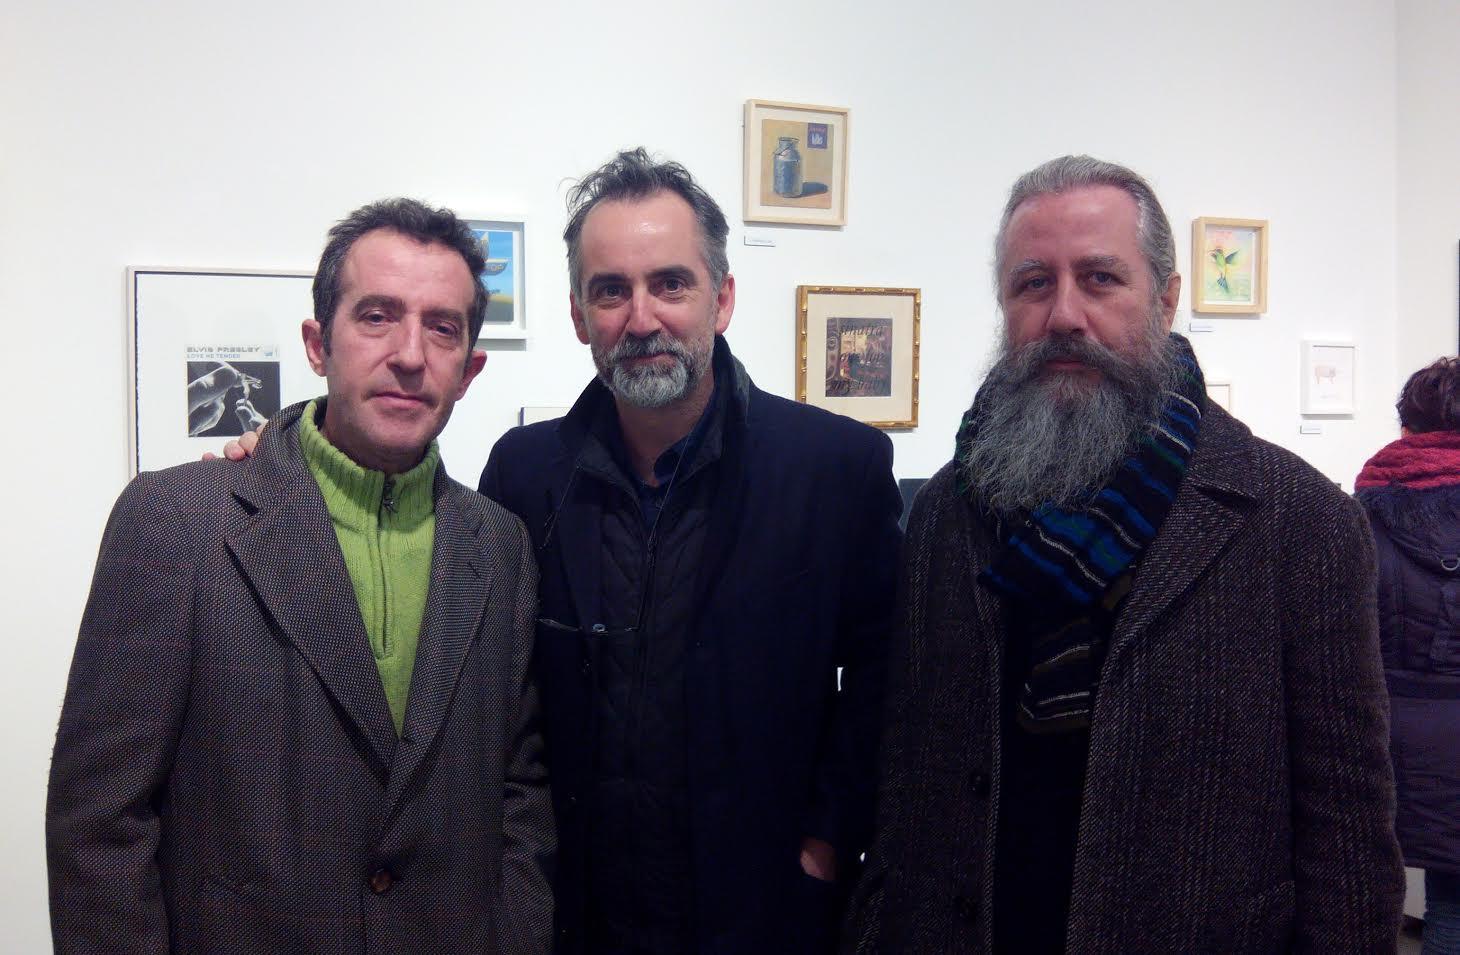 Dis Berlin, Joël Mestre y Angel Mateo Charris. Galería My Name's Lolita Art (Madrid, 2015)